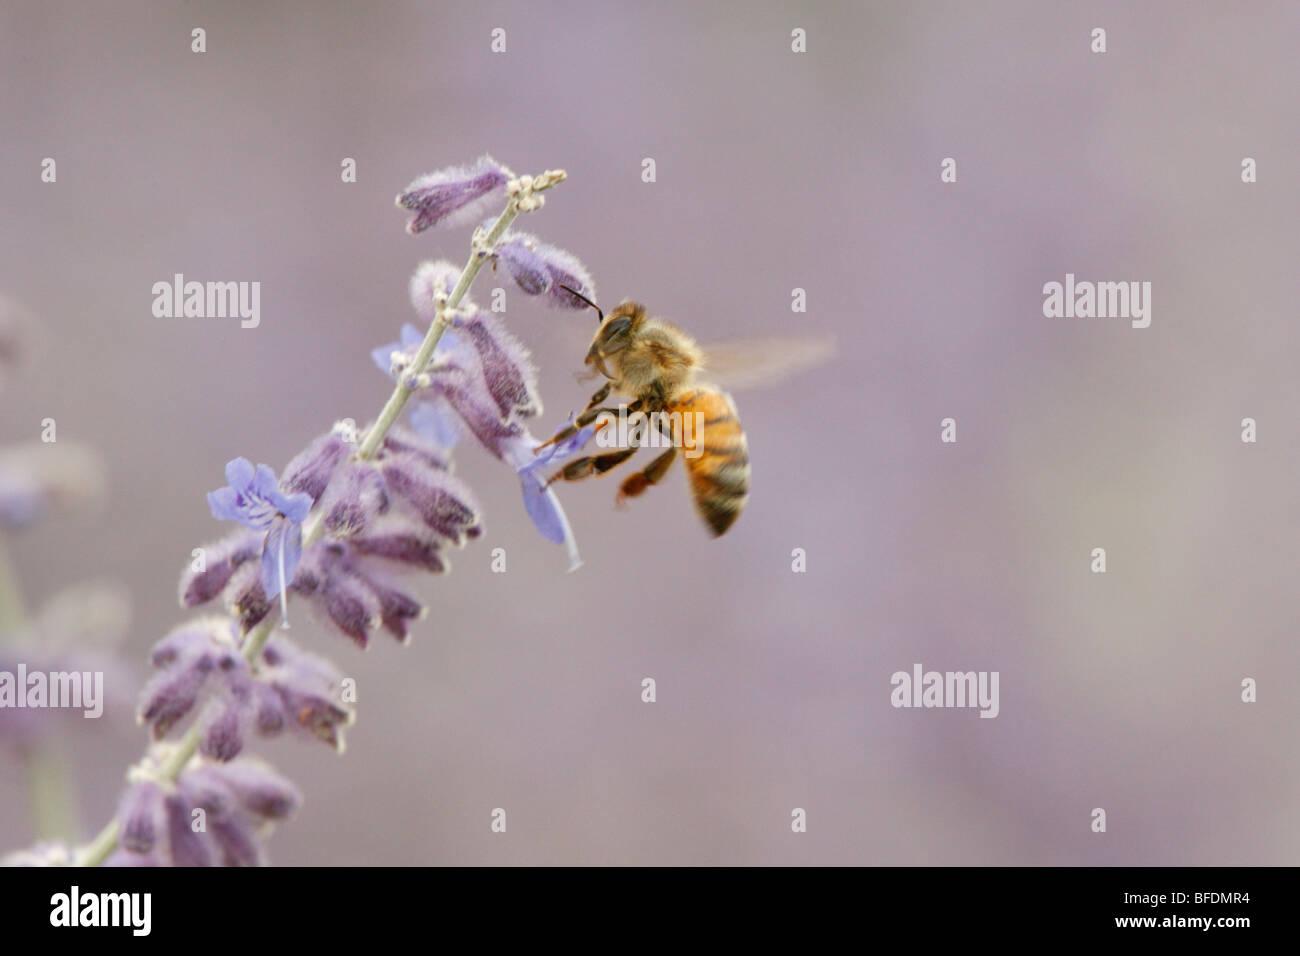 Honey Bee getting Nectar - Stock Image